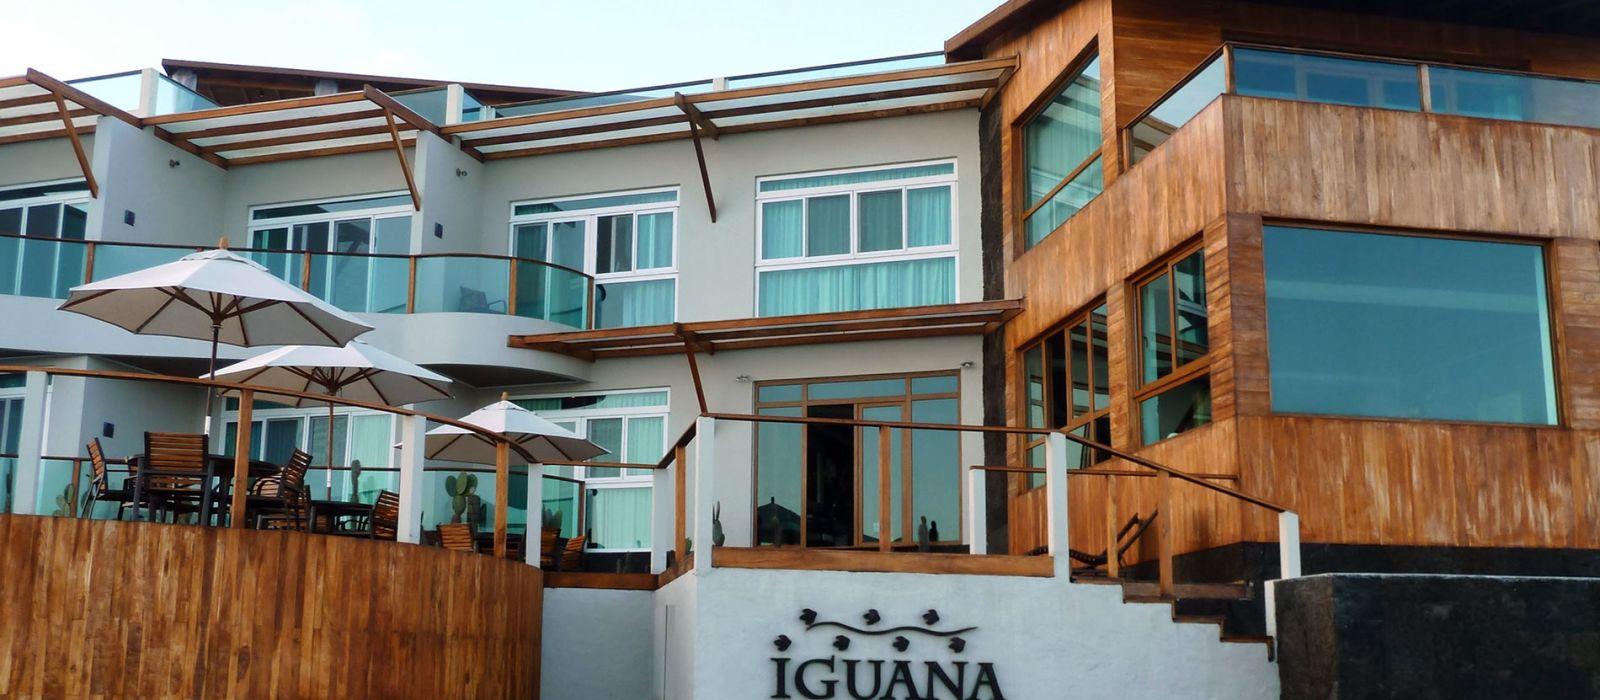 Hotel Iguana Crossing Ecuador/Galapagos